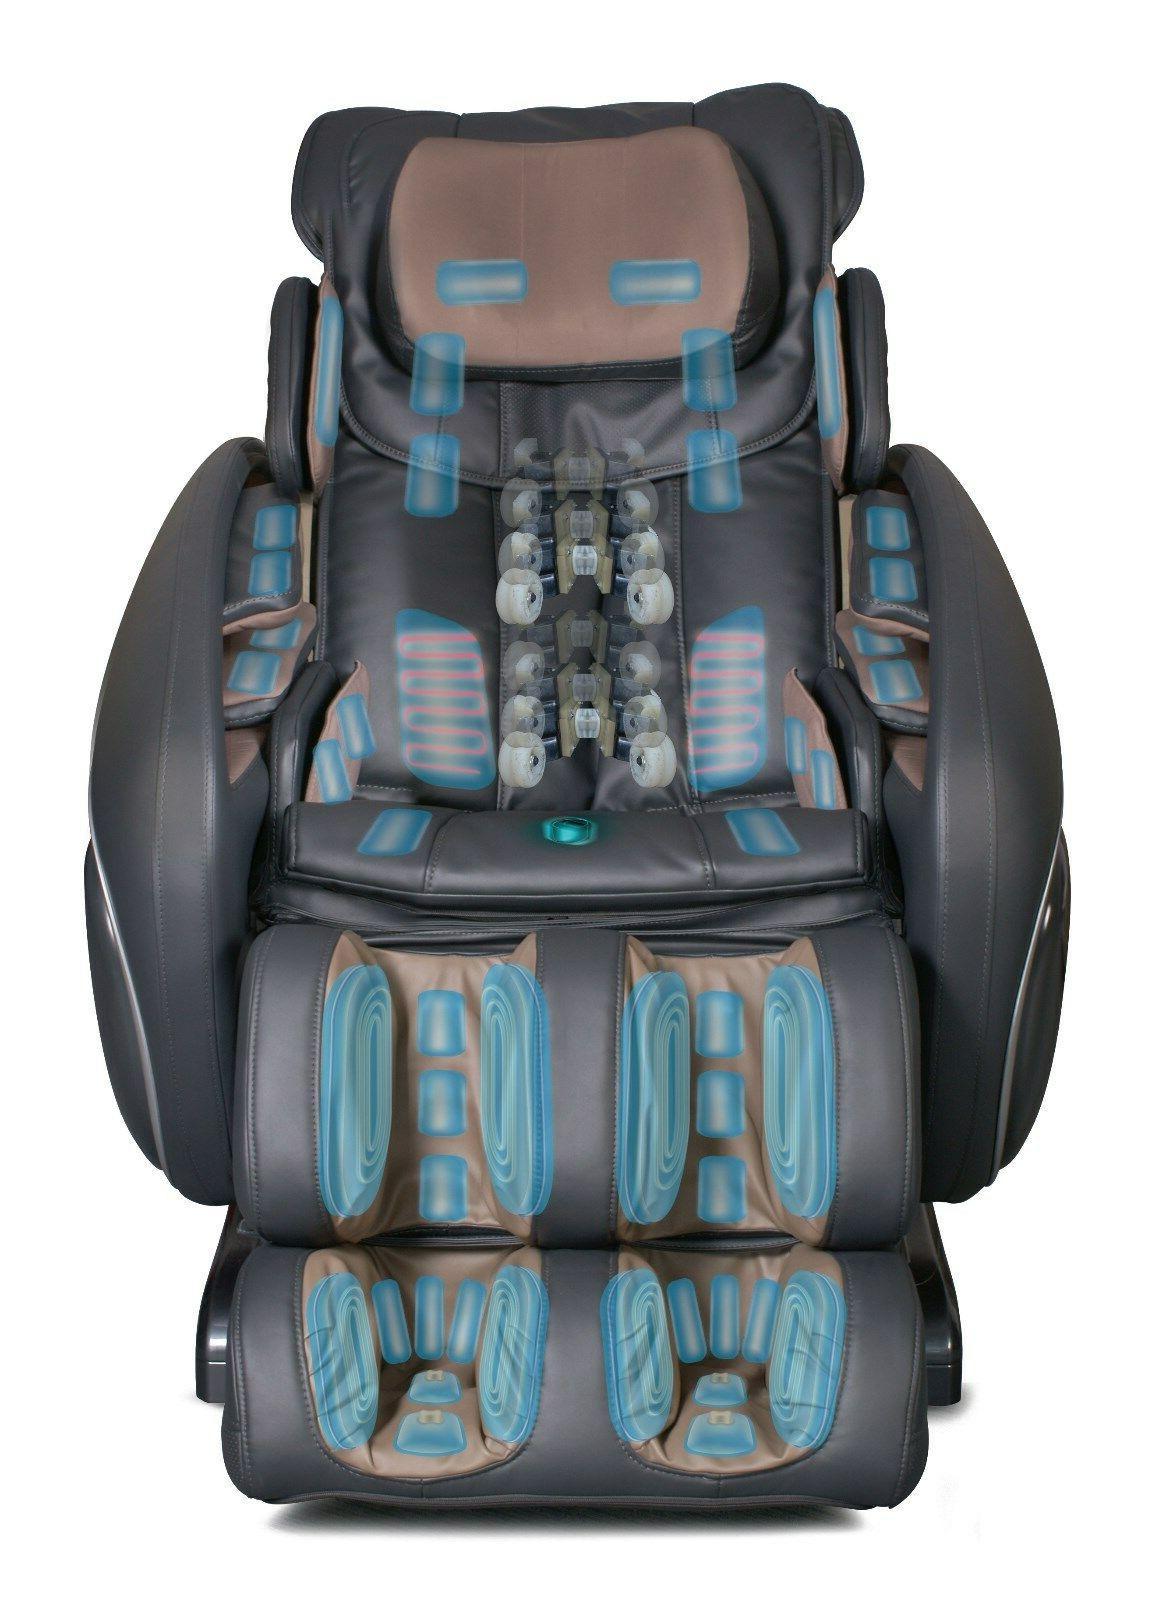 Osaki Gravity Massage Chair + Warranty